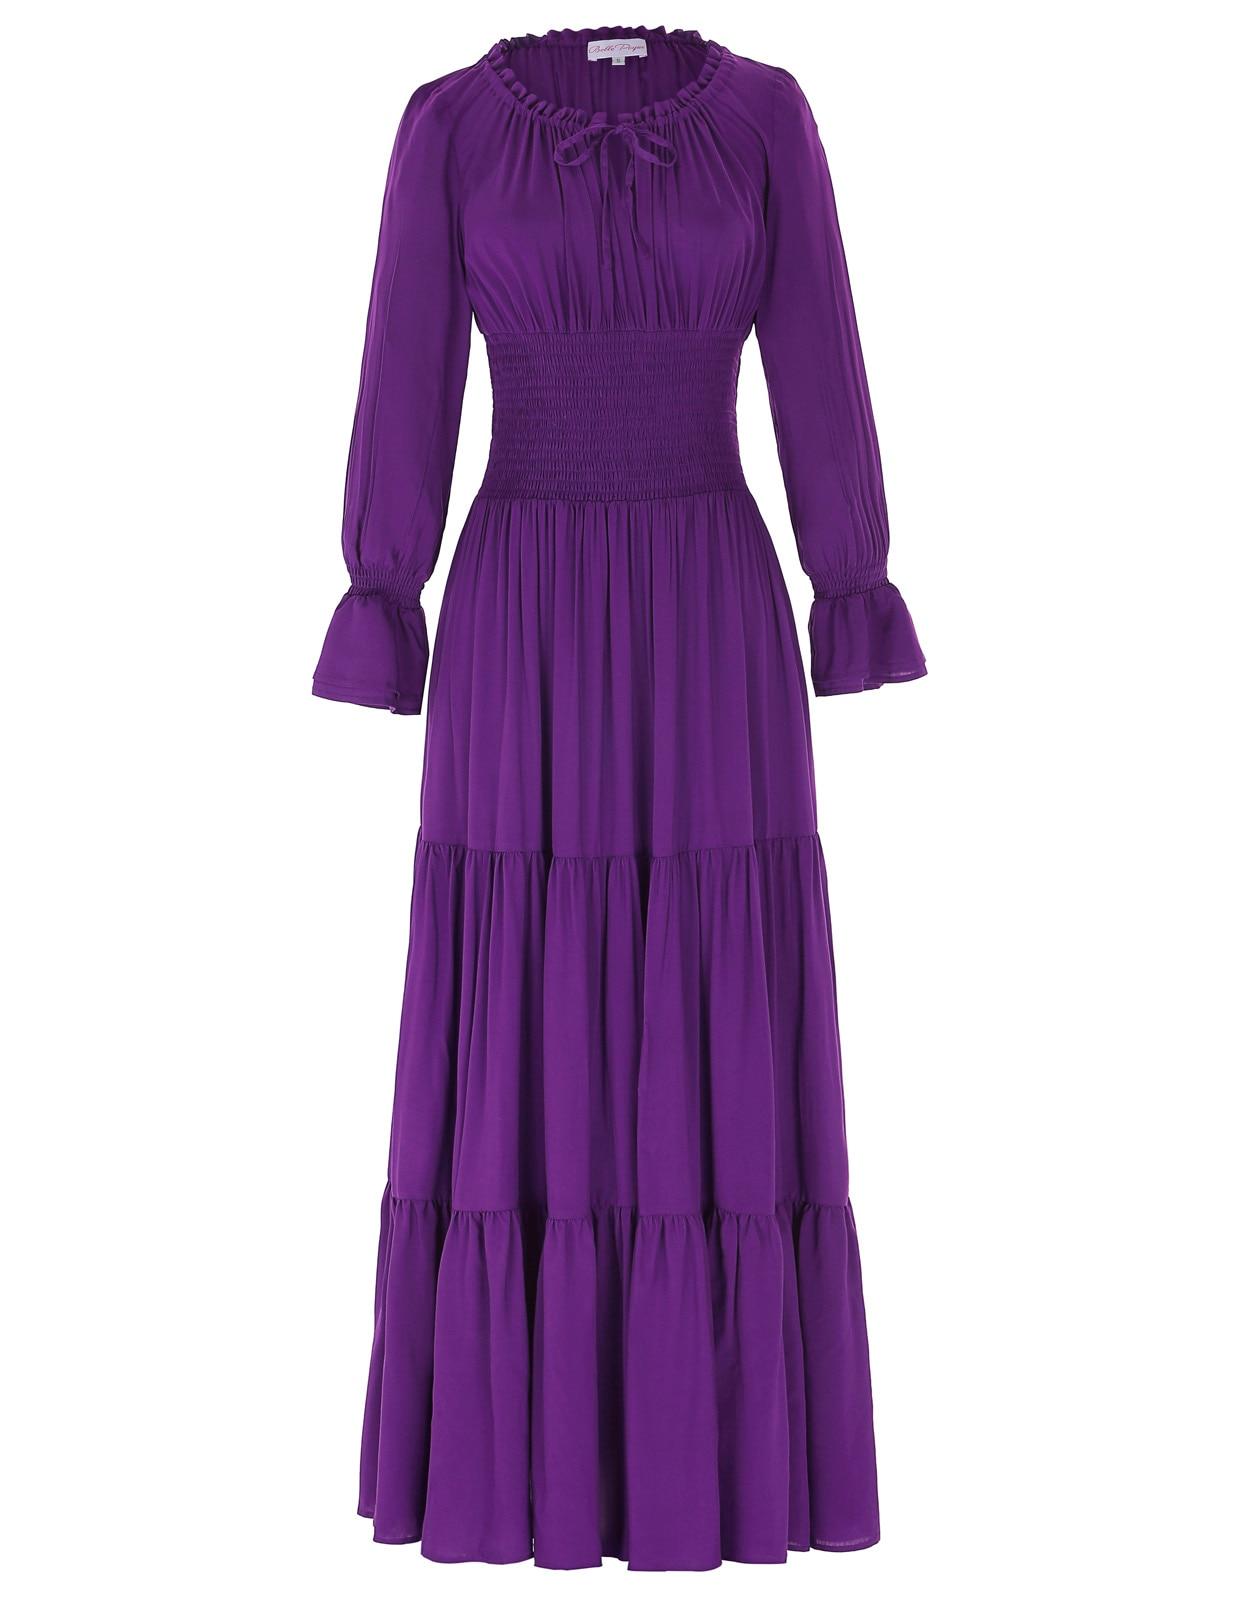 Belle Poque Punk Rave Gothic Prom Ball Vintage Cotton Steampunk Victorian Dress